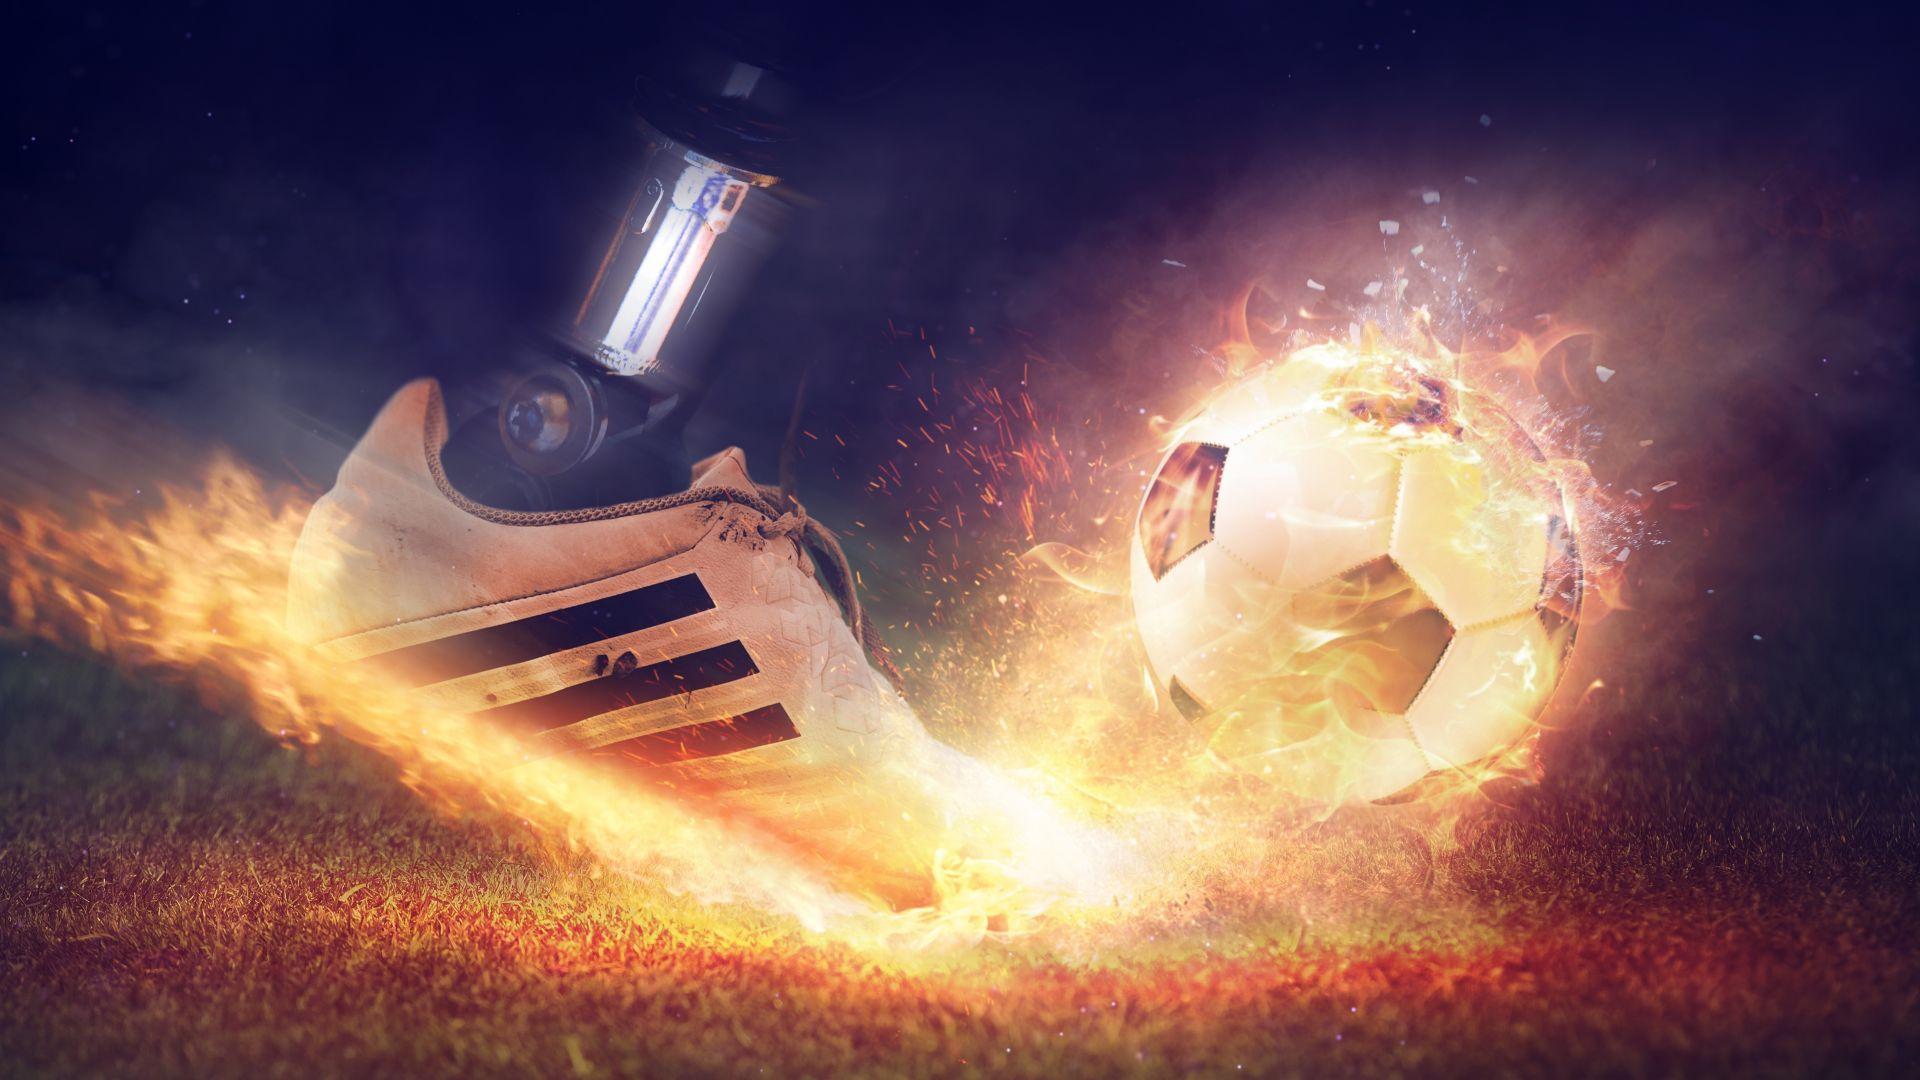 Wallpaper Football shoes, fire, smoke, digital art, 5k